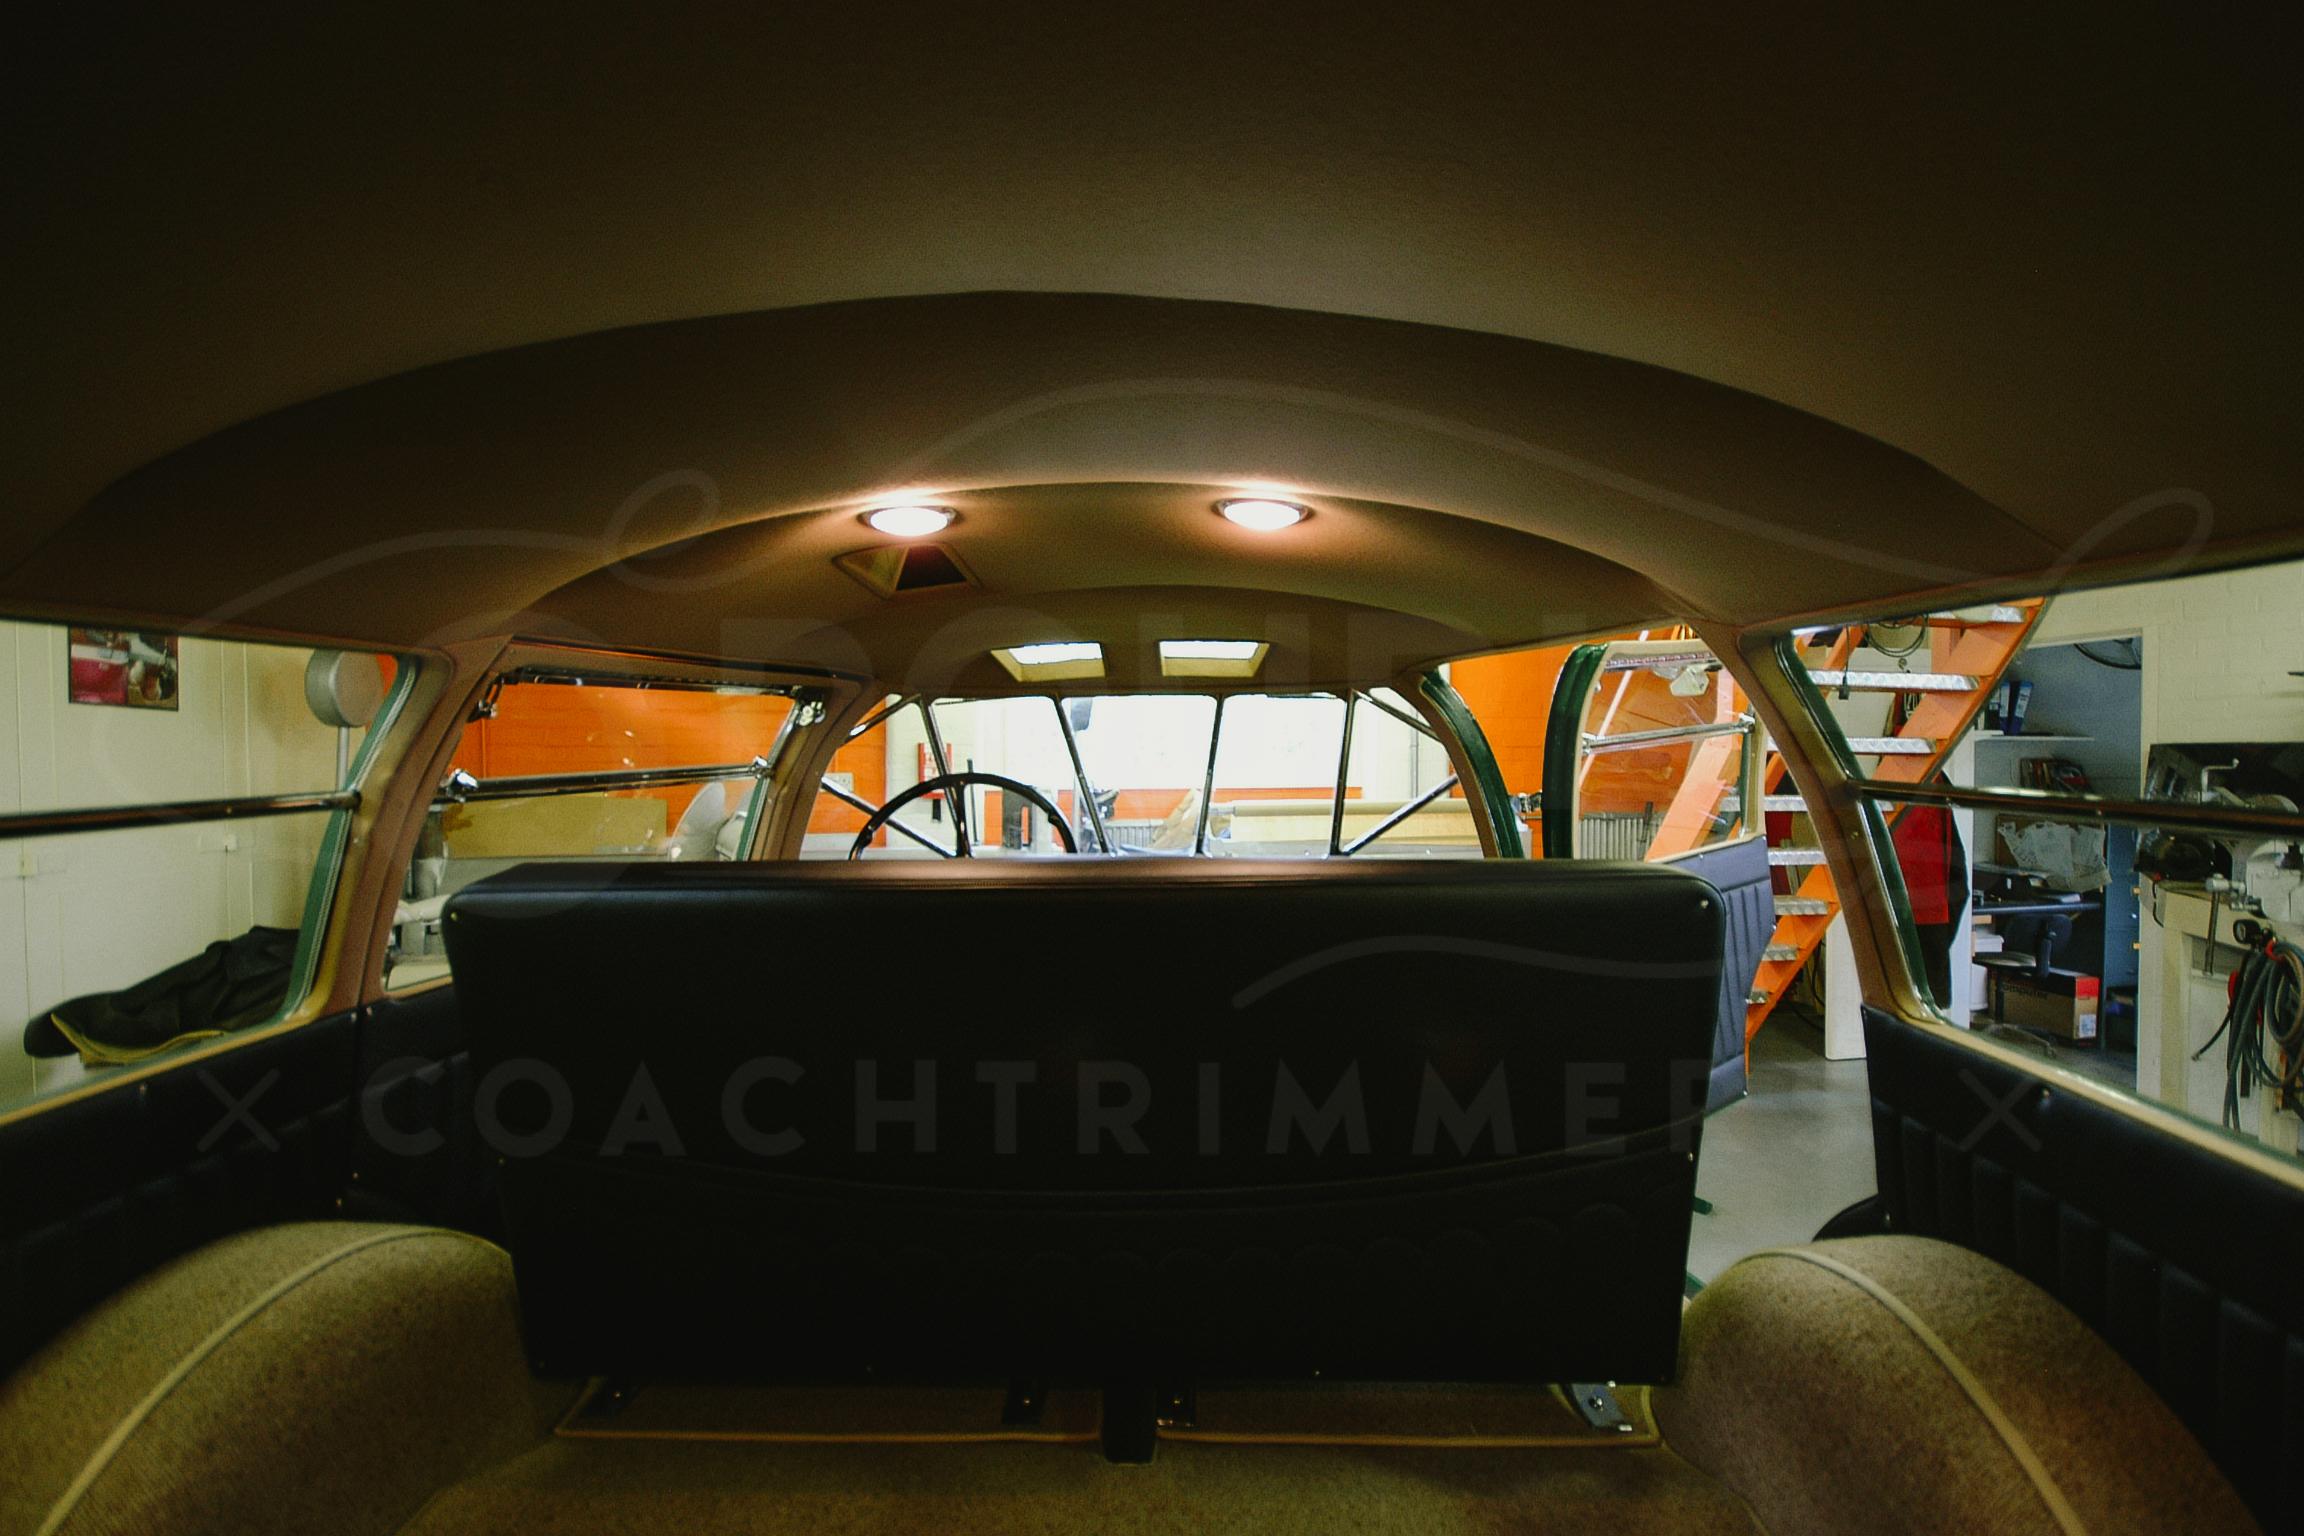 o-rourke-coachtrimmers-dymaxion-car-3-8.jpg